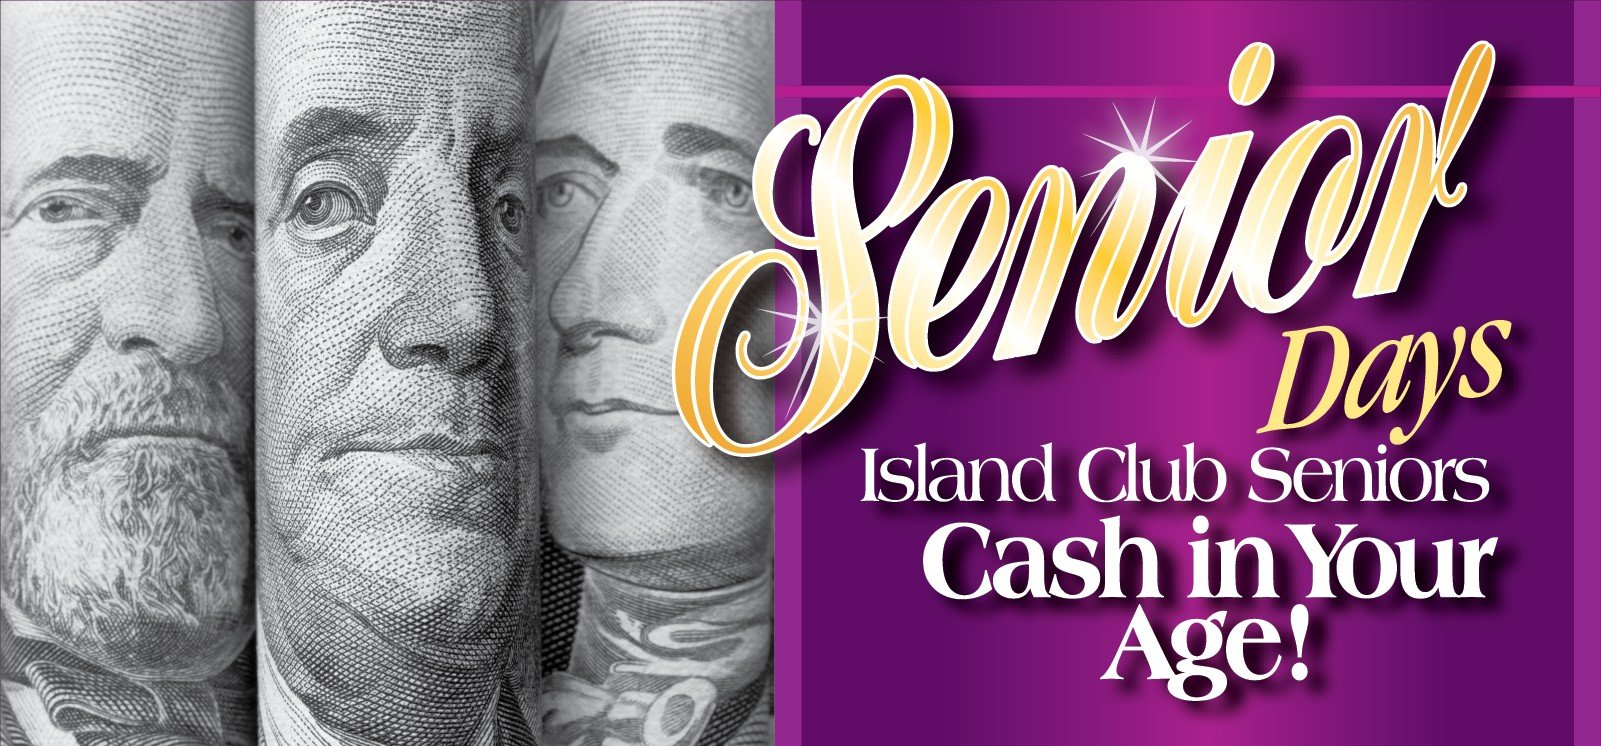 Seniors Cash October '15